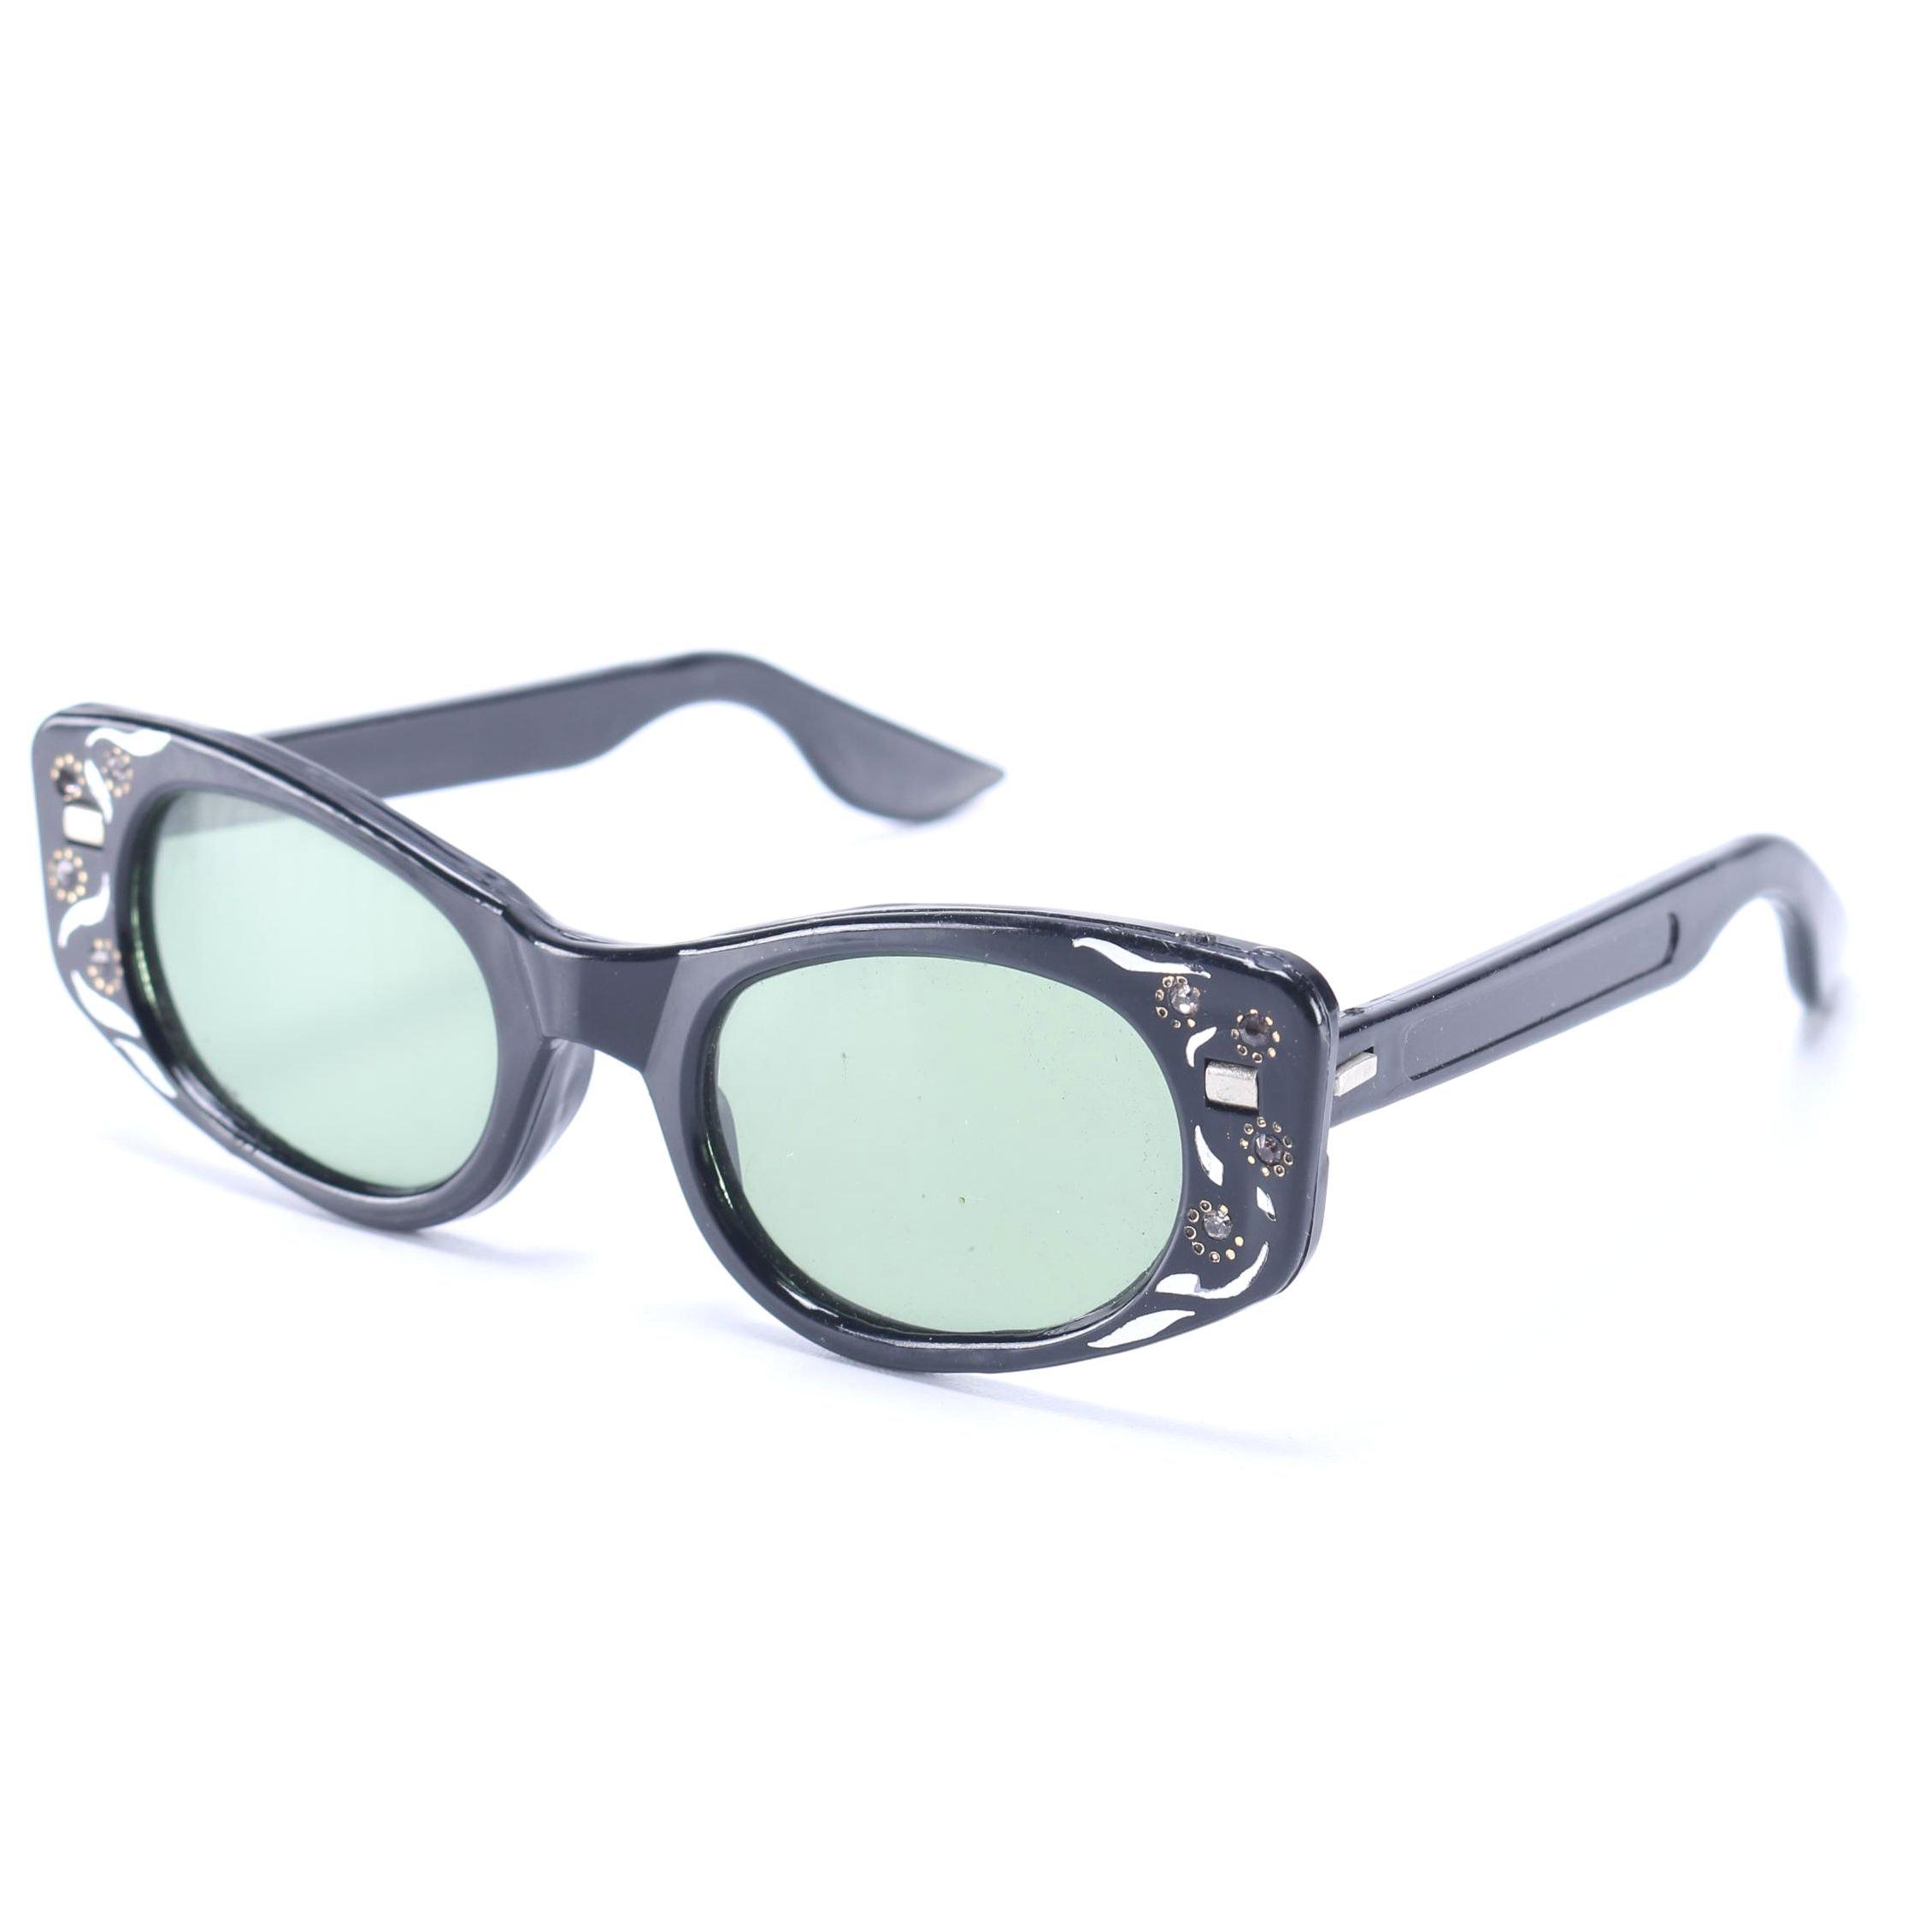 Women's Vintage Glasses